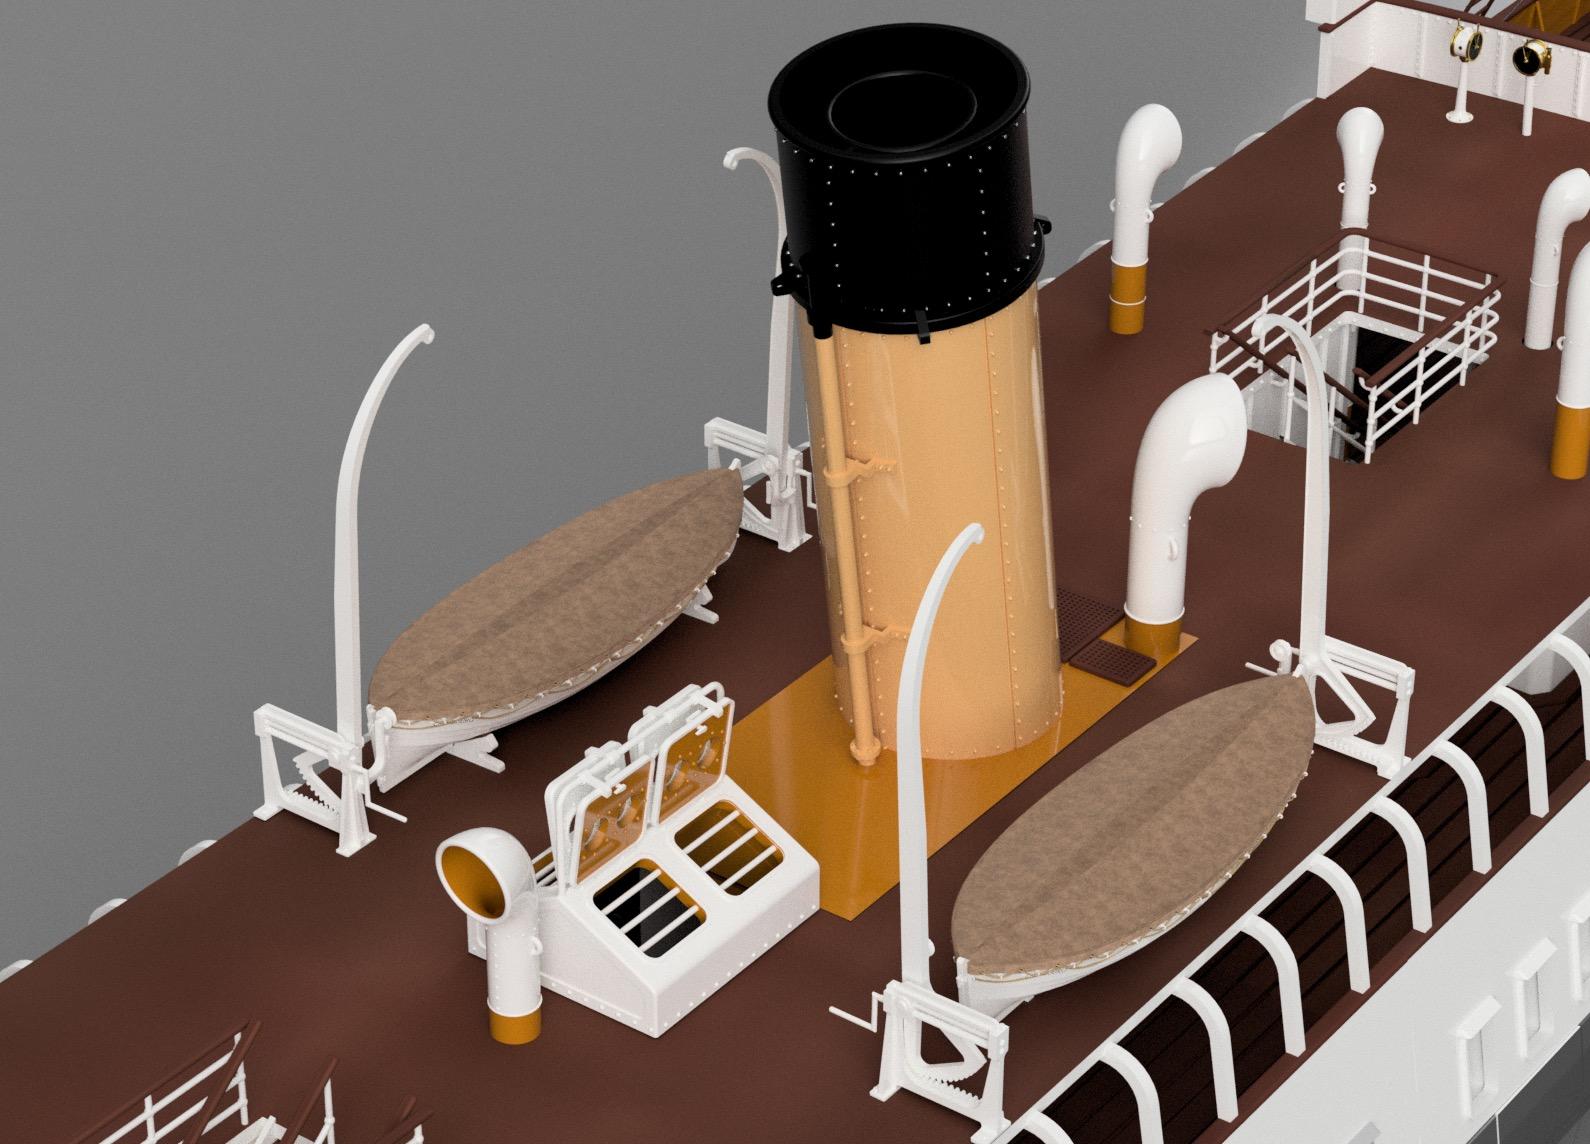 SS Nomadic (Modélisation 3D 1/200°) par Iceman29 - Page 8 Screen52